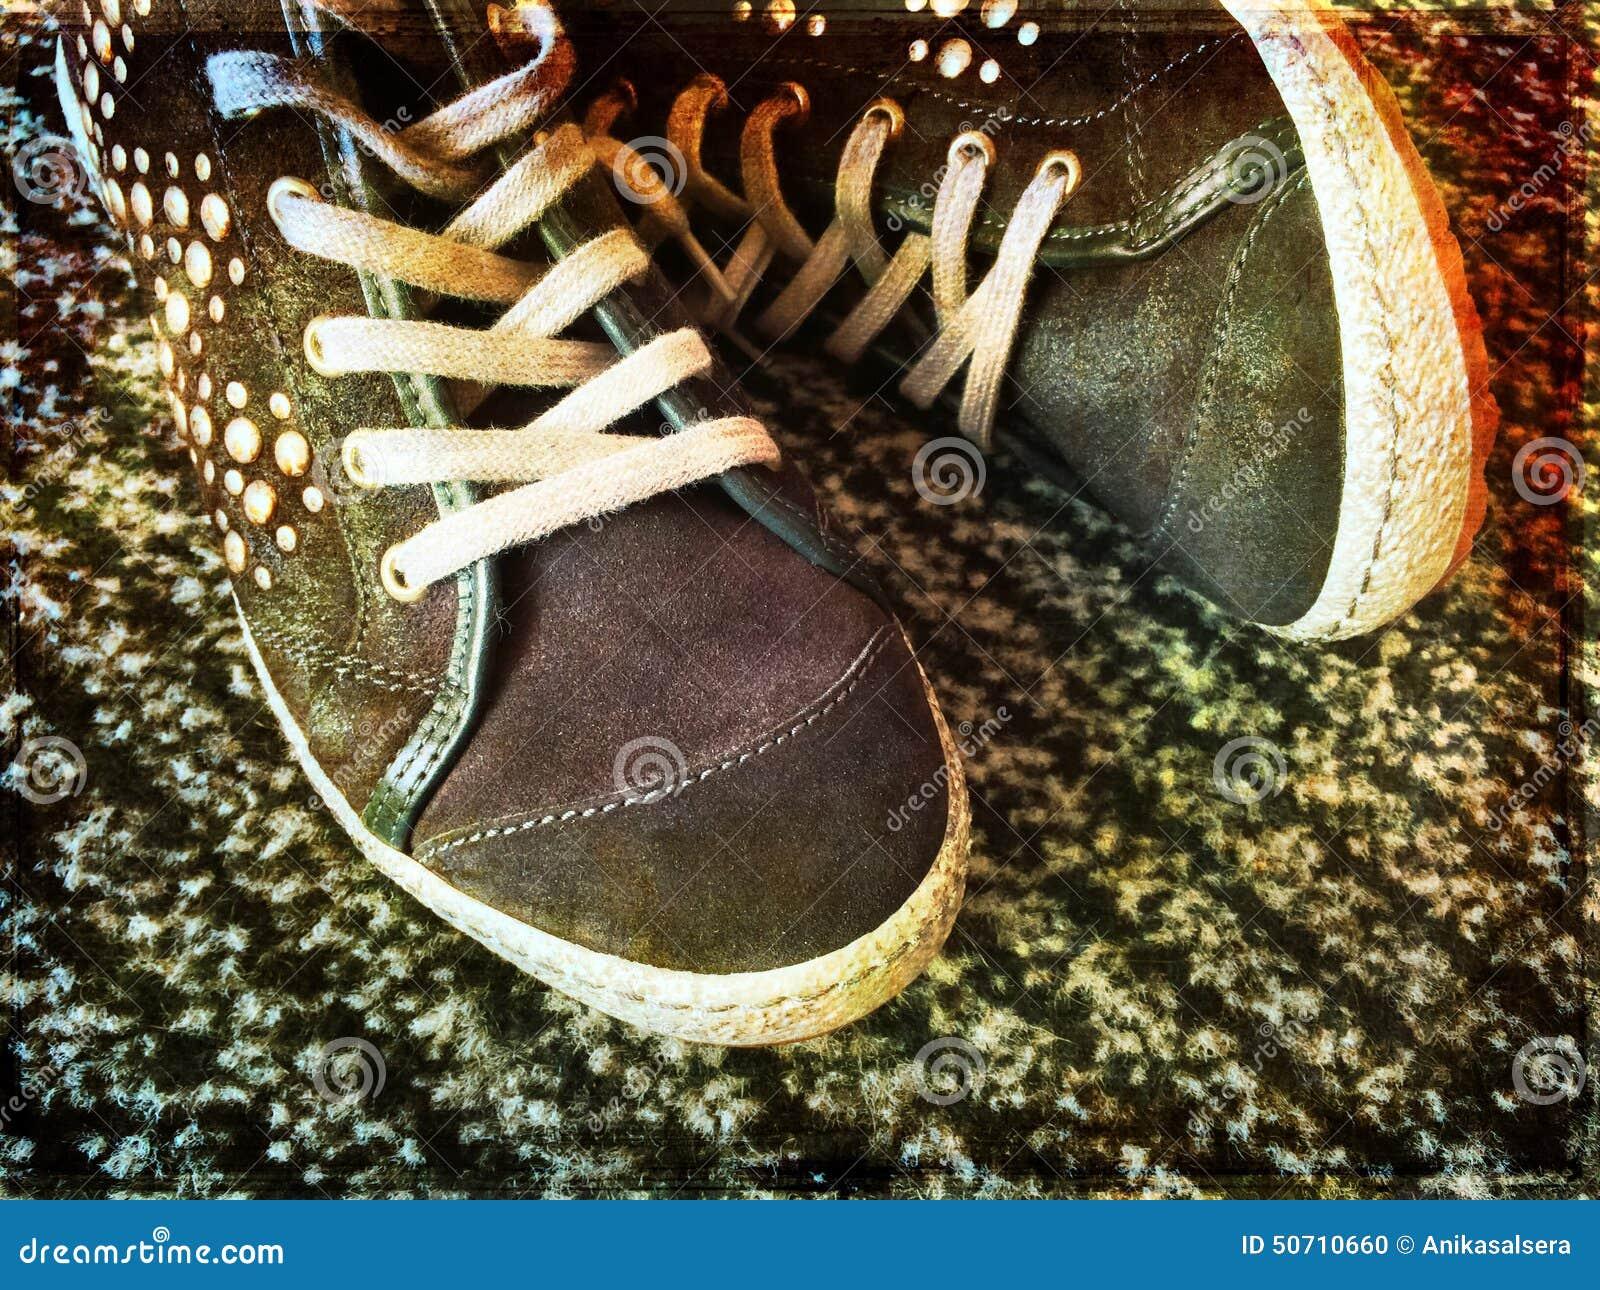 3688027dcfa Μοντέρνα εφηβικά παπούτσια στοκ εικόνες. εικόνα από κανένας - 50710660